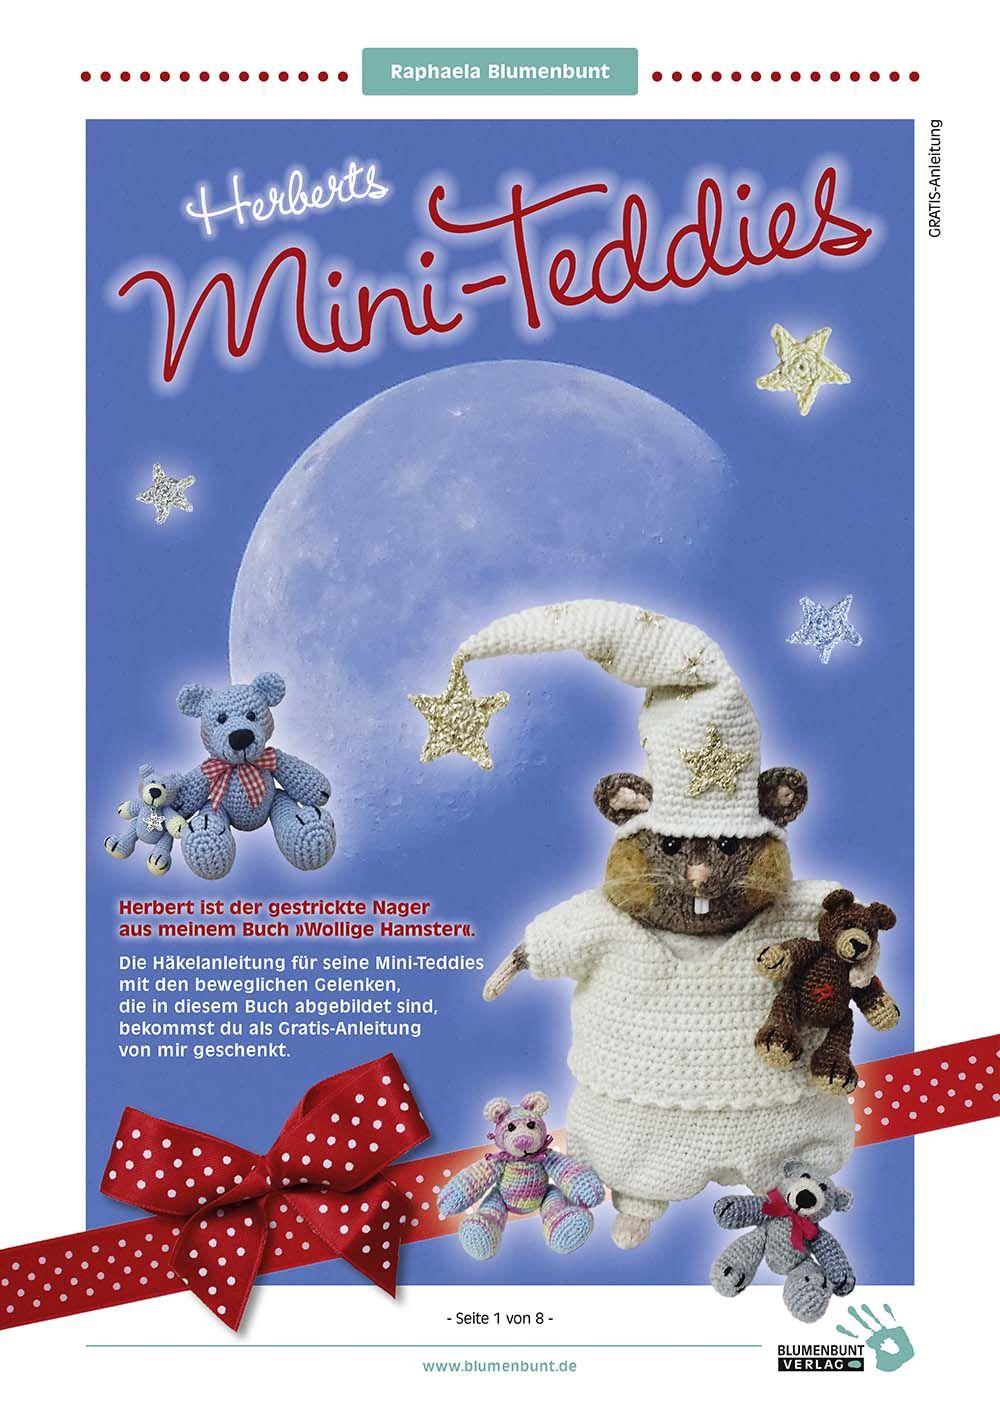 Herberts MINI-TEDDIES aus dem Buch \